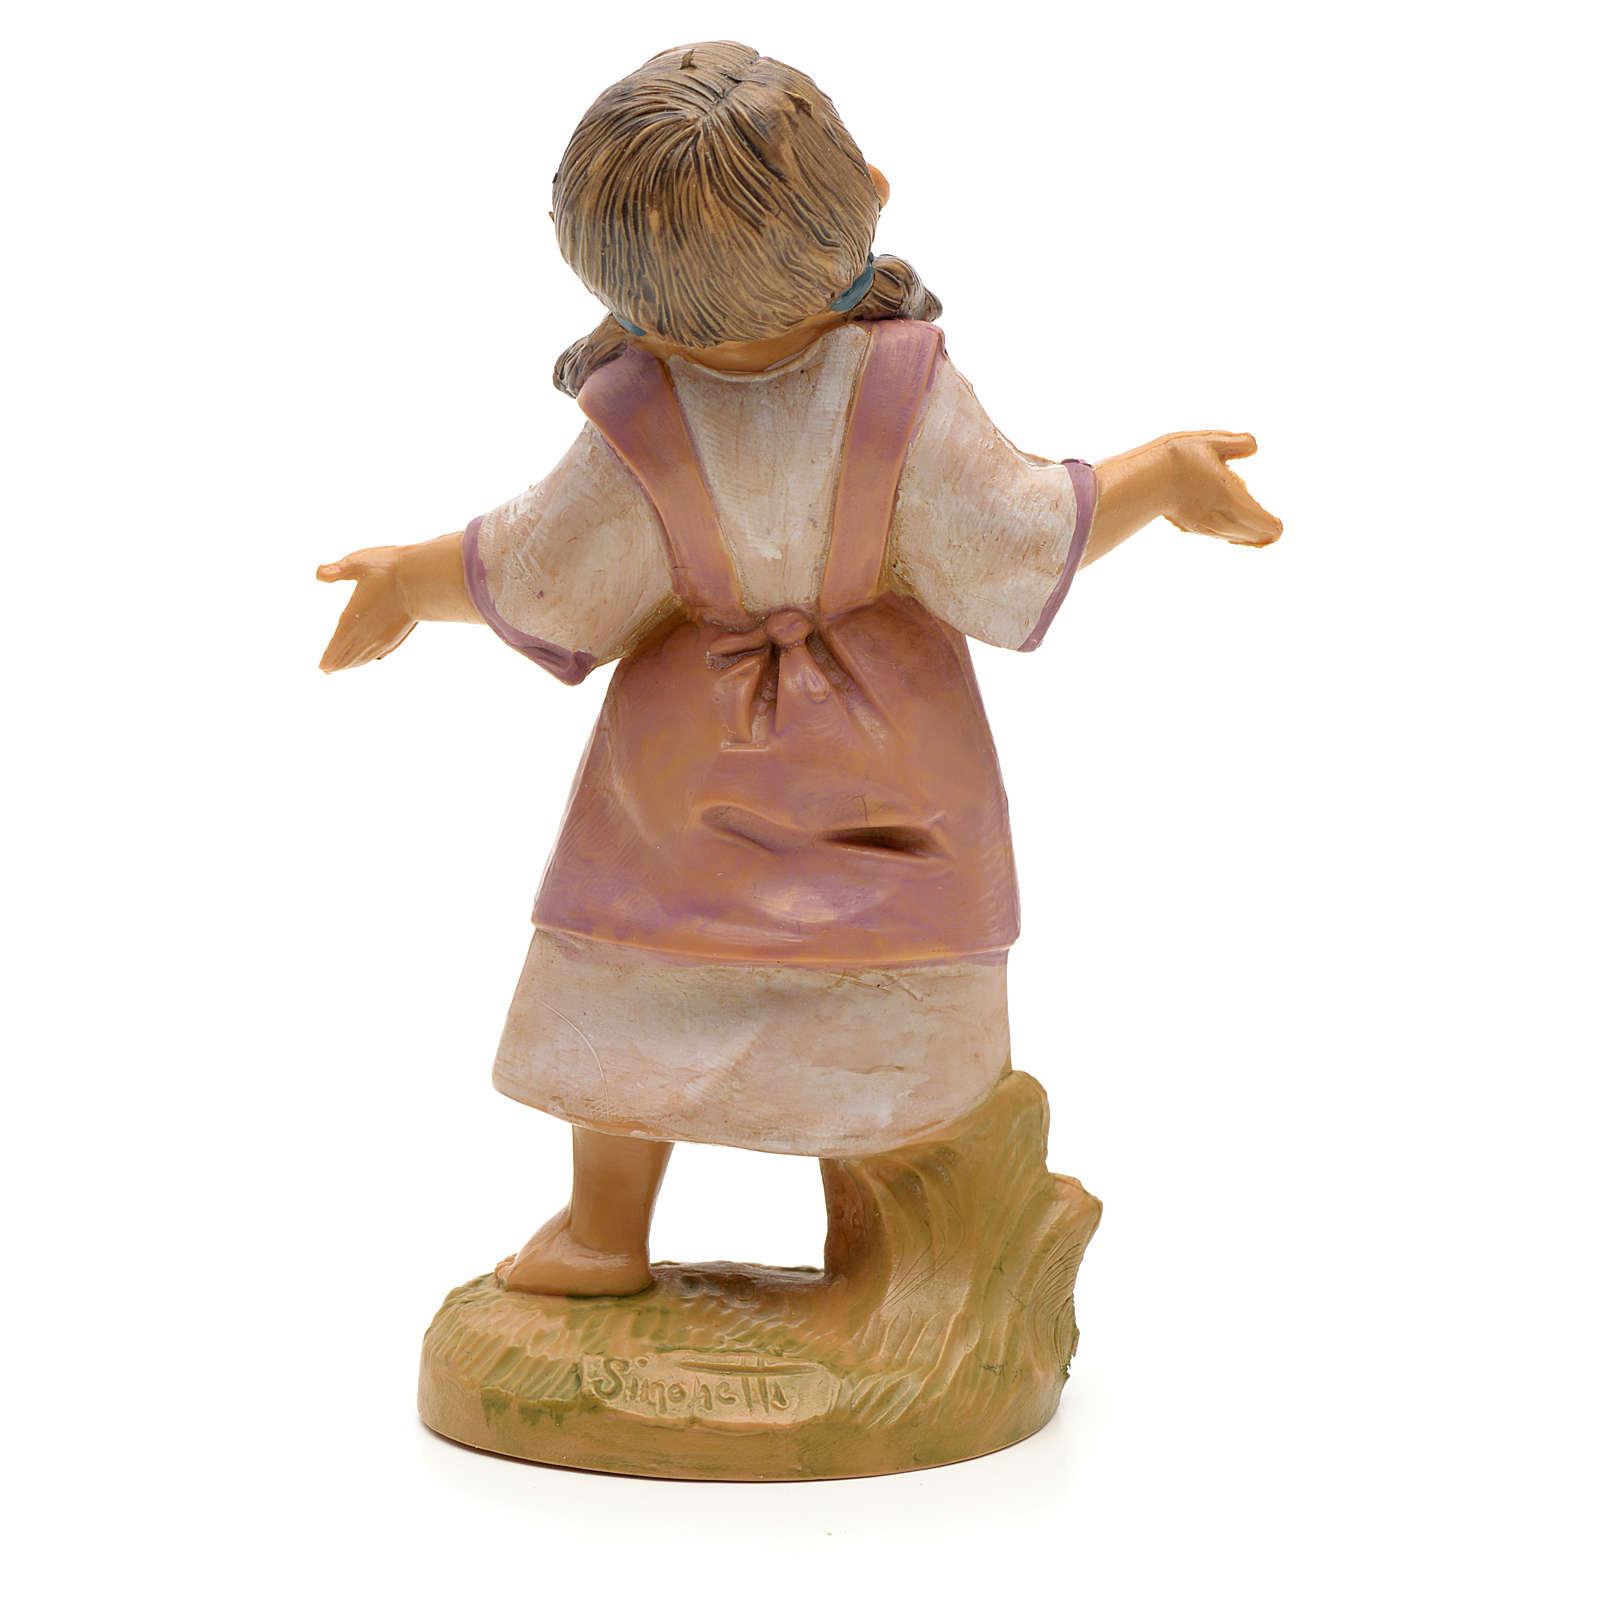 Petite fille crèche Fontanini 19 cm 4